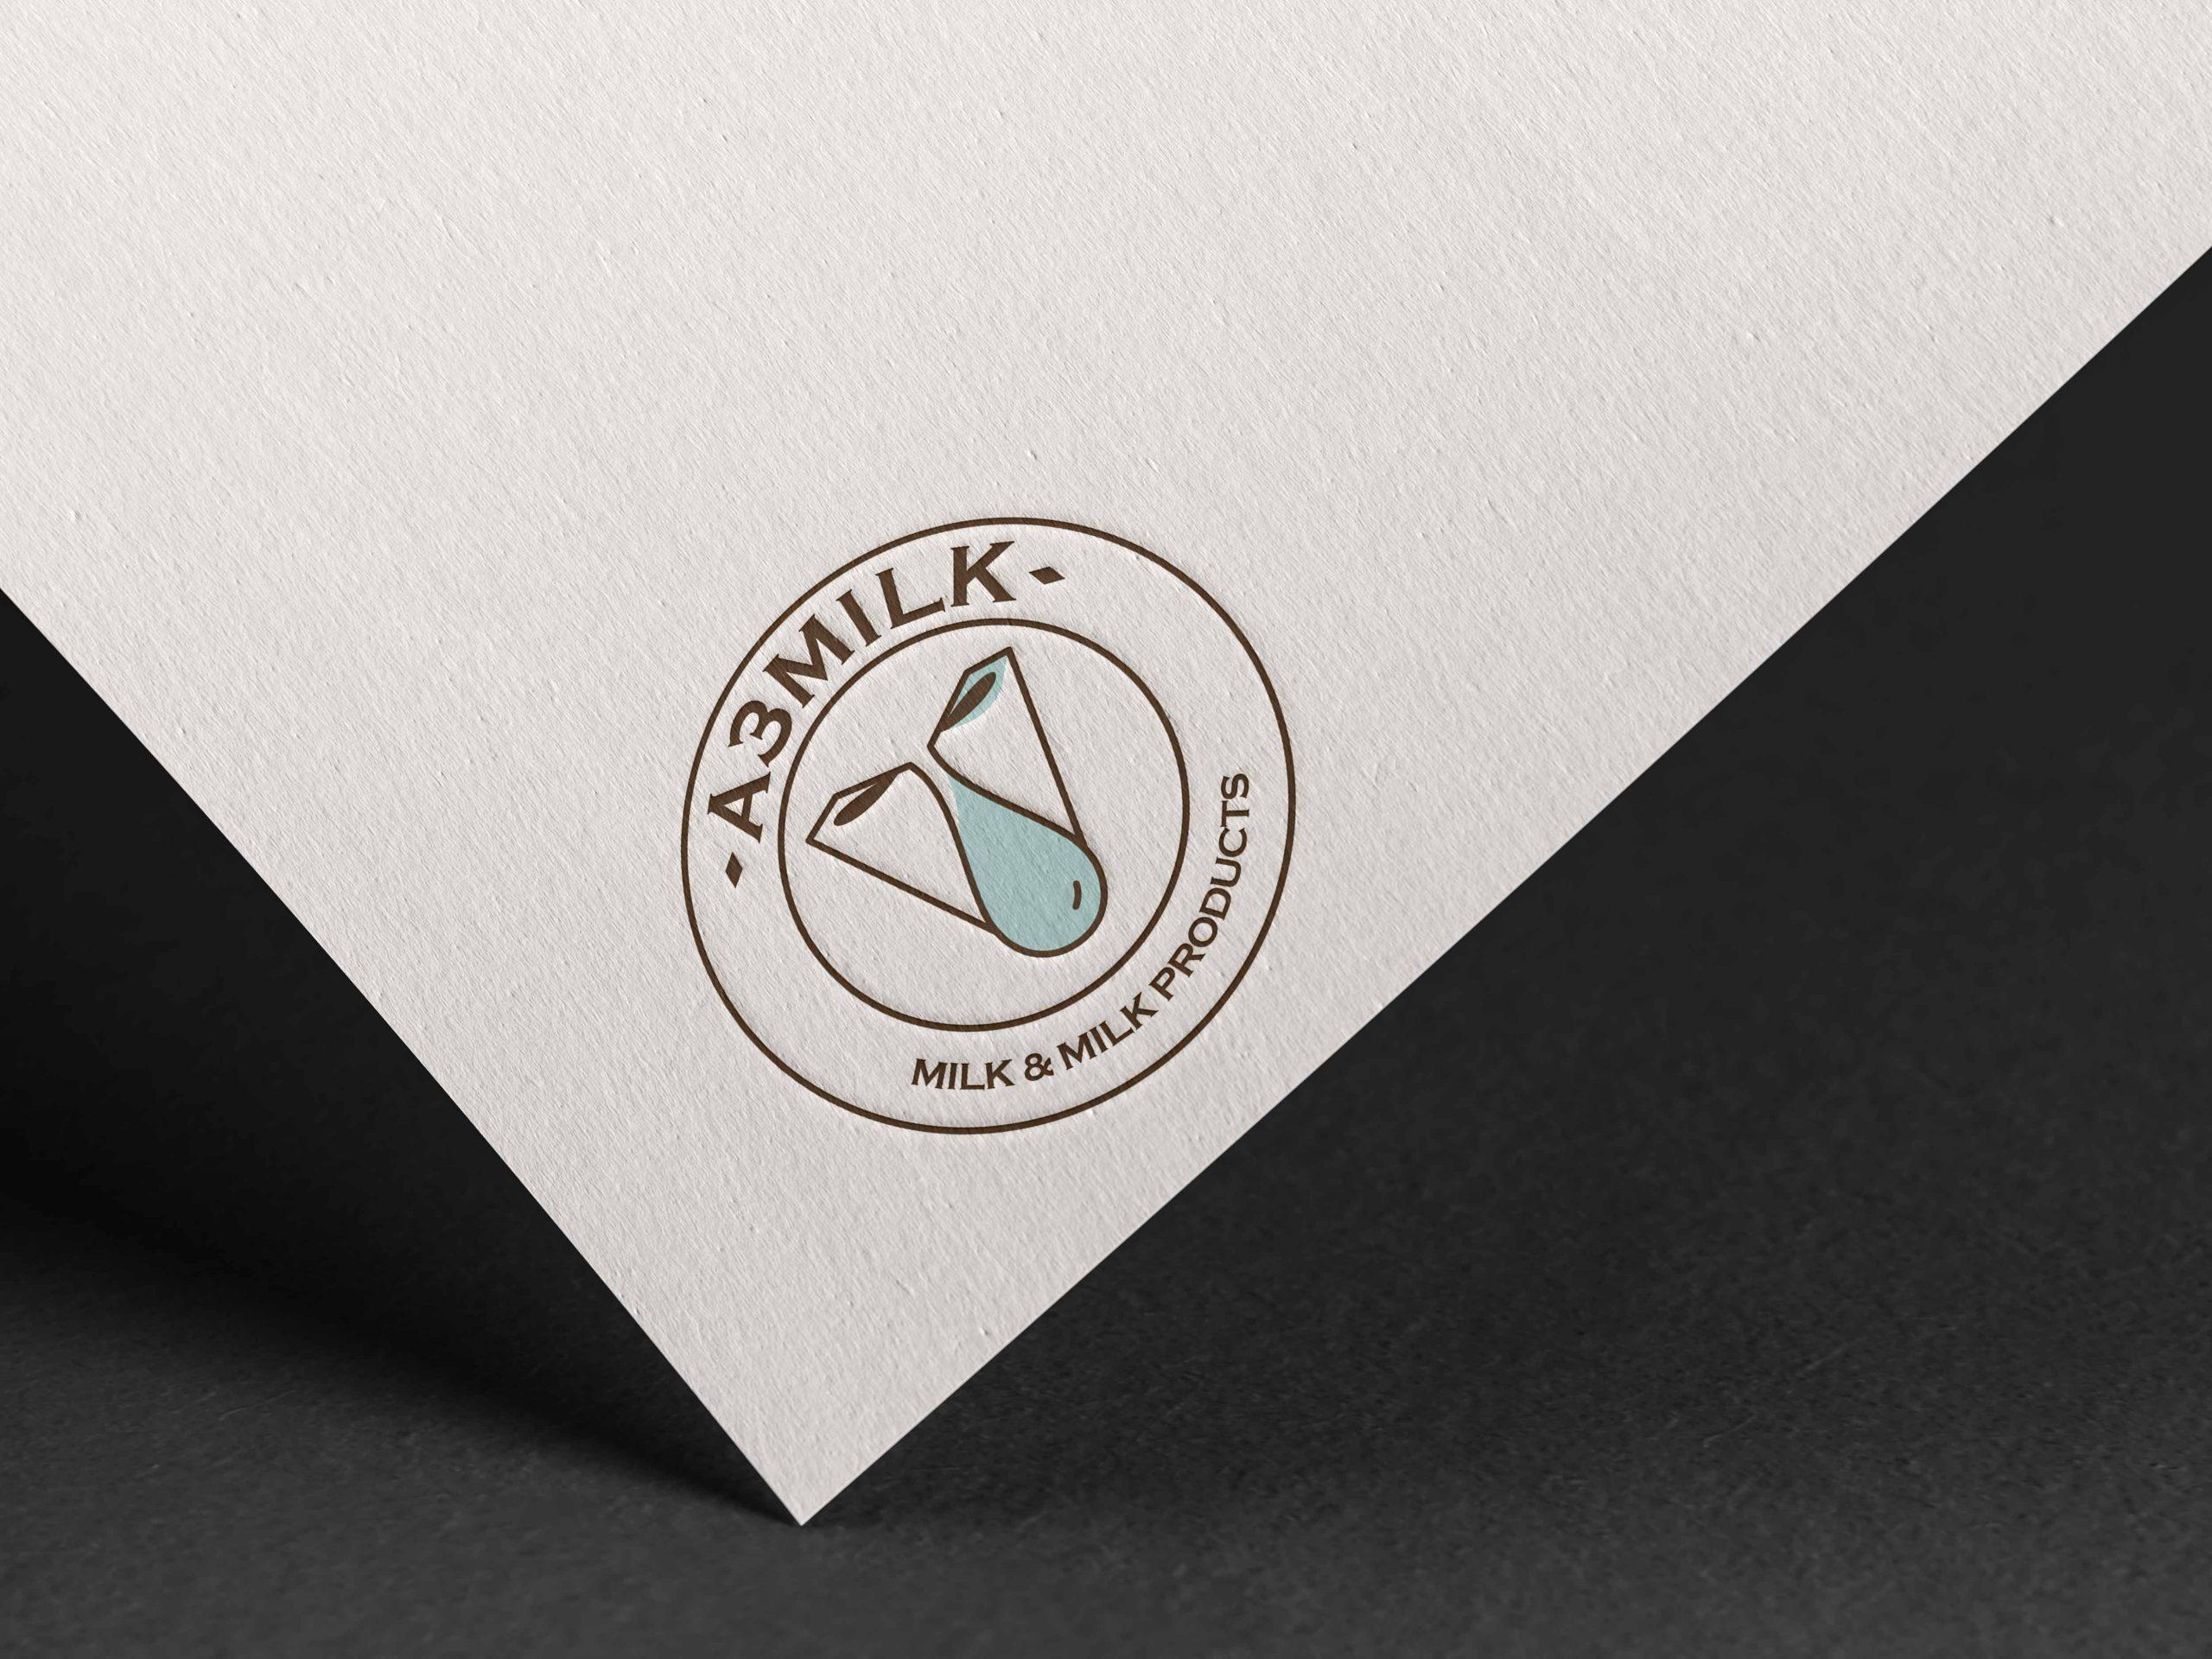 A3 Milk Logo Design by WDSOFT